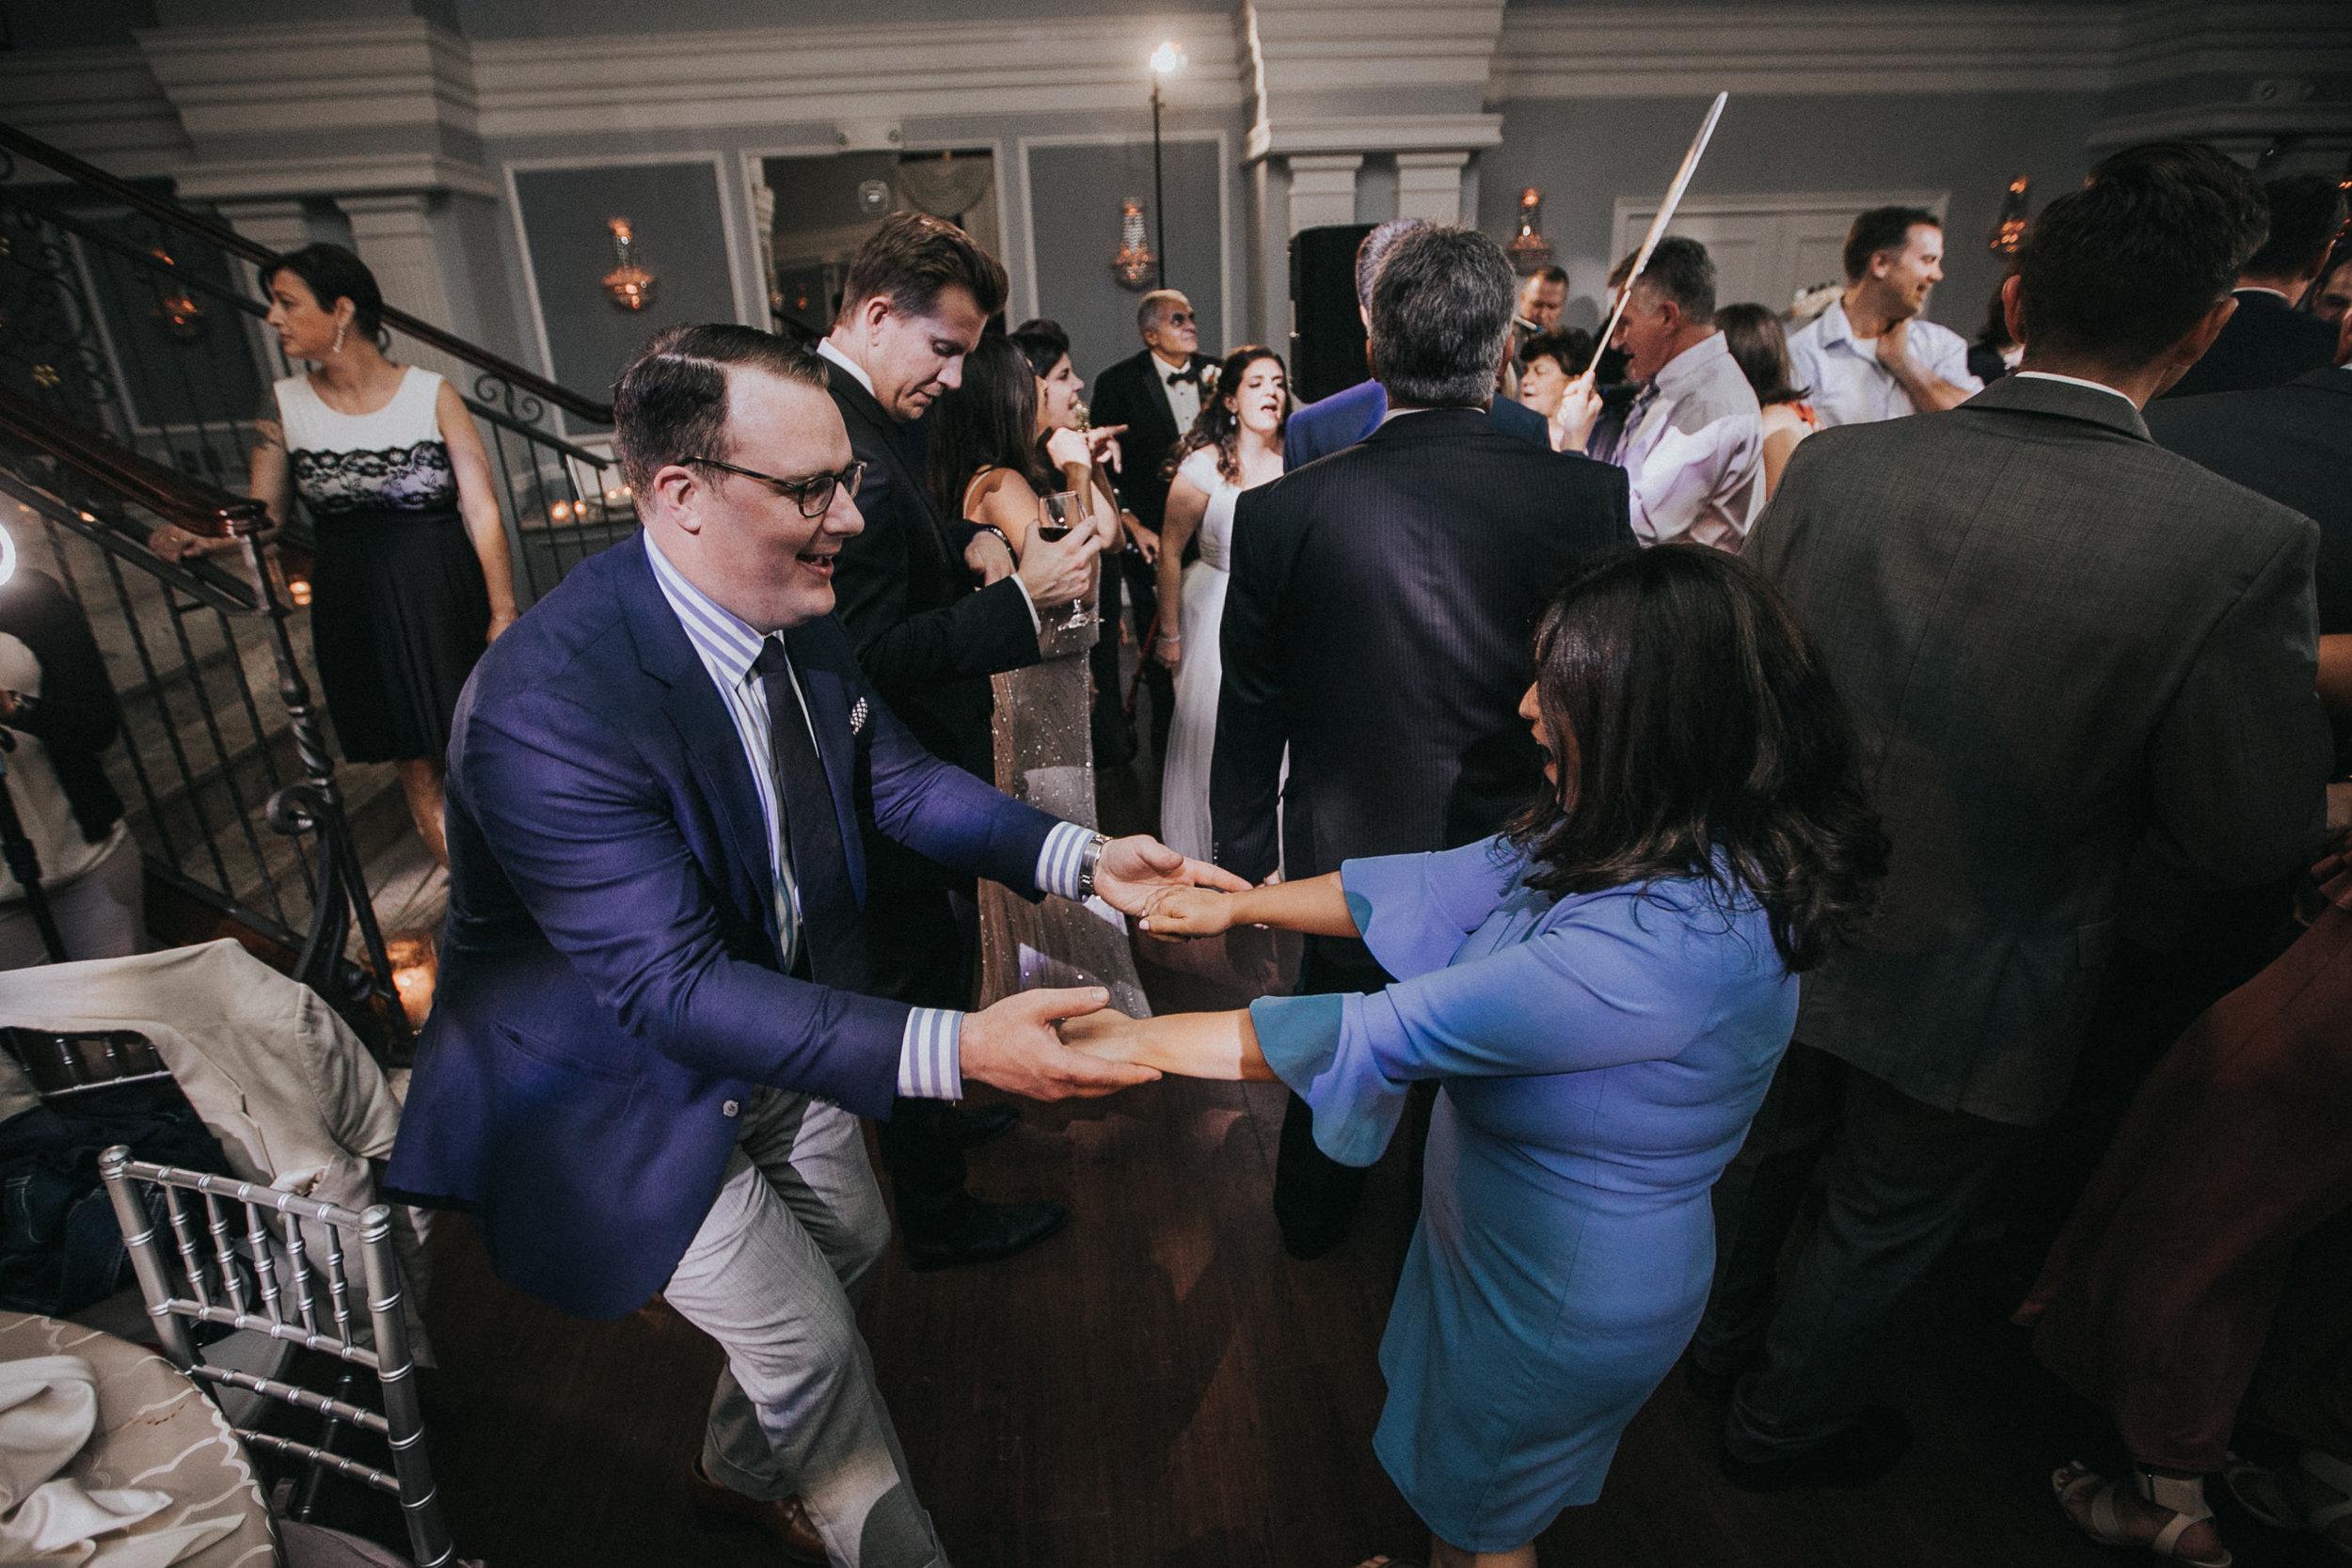 JennaLynnPhotography-NJWeddingPhotographer-Philadelphia-Wedding-ArtsBallroom-Reception-166.jpg